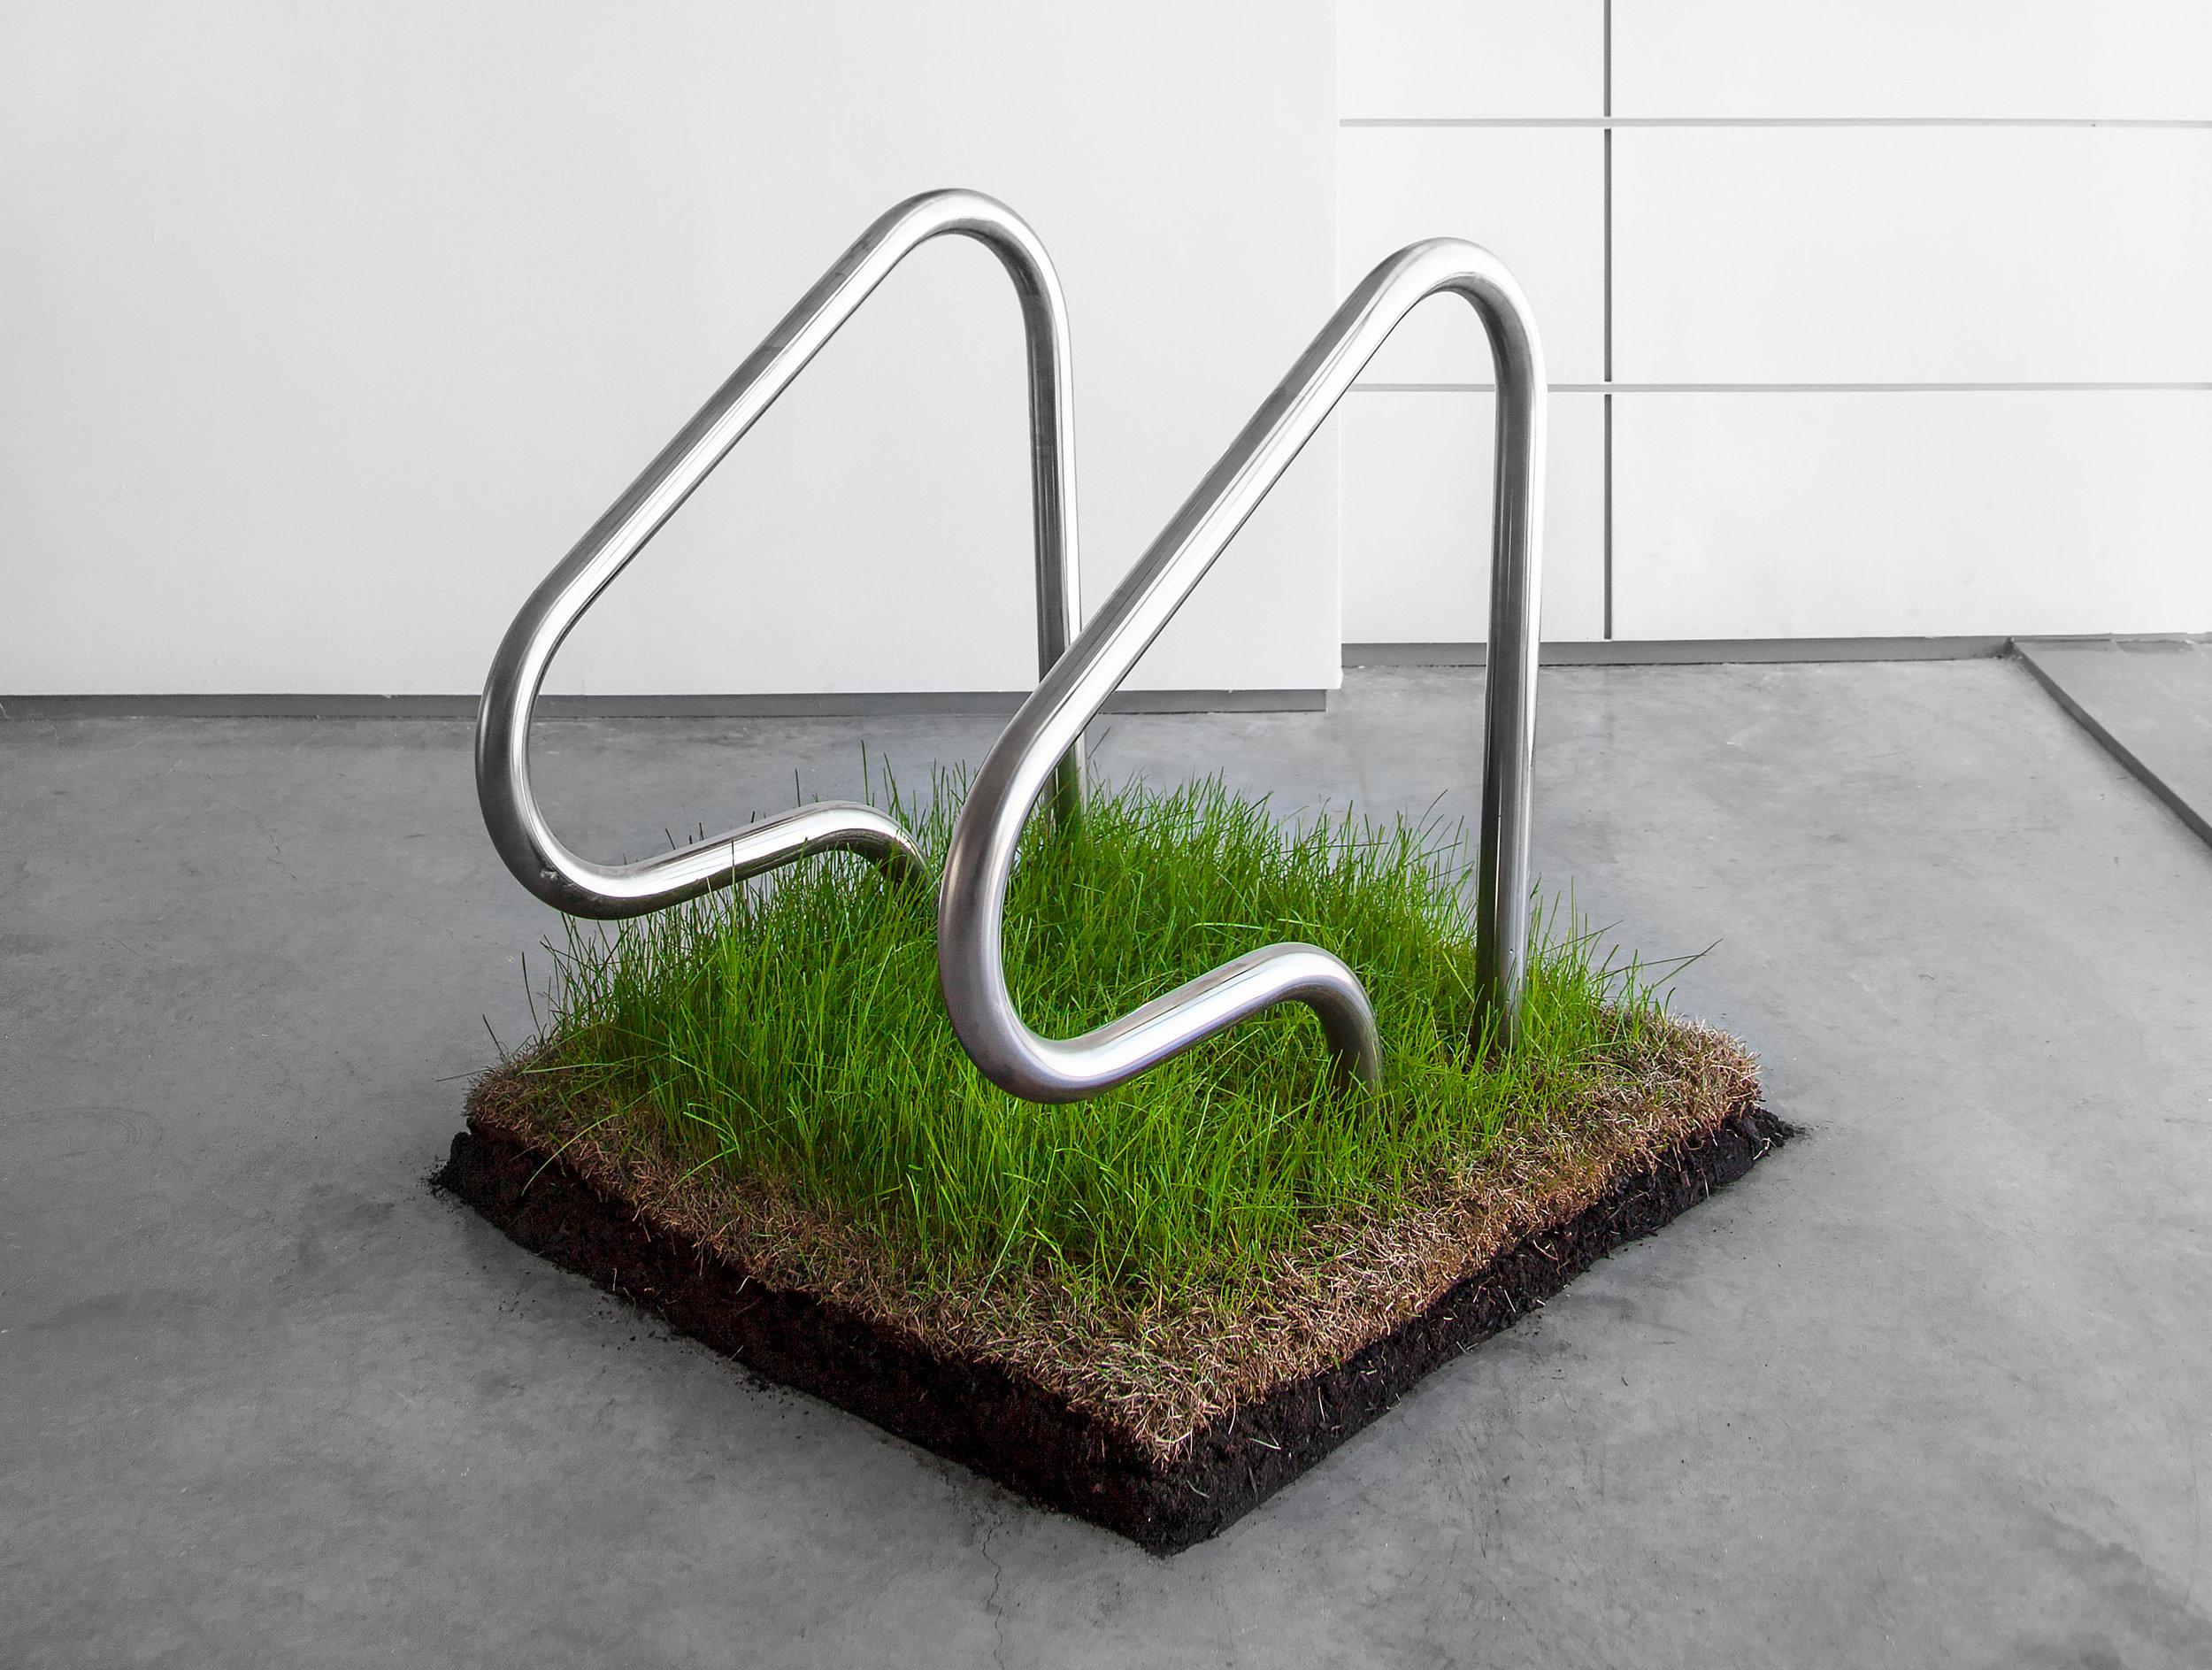 "Hand Rails  ,  2014, stainless steel, grass, soil, wood base, 36""x 36"" x 36"" (91.4 cm x 91.4 cm x 91.4 cm)"